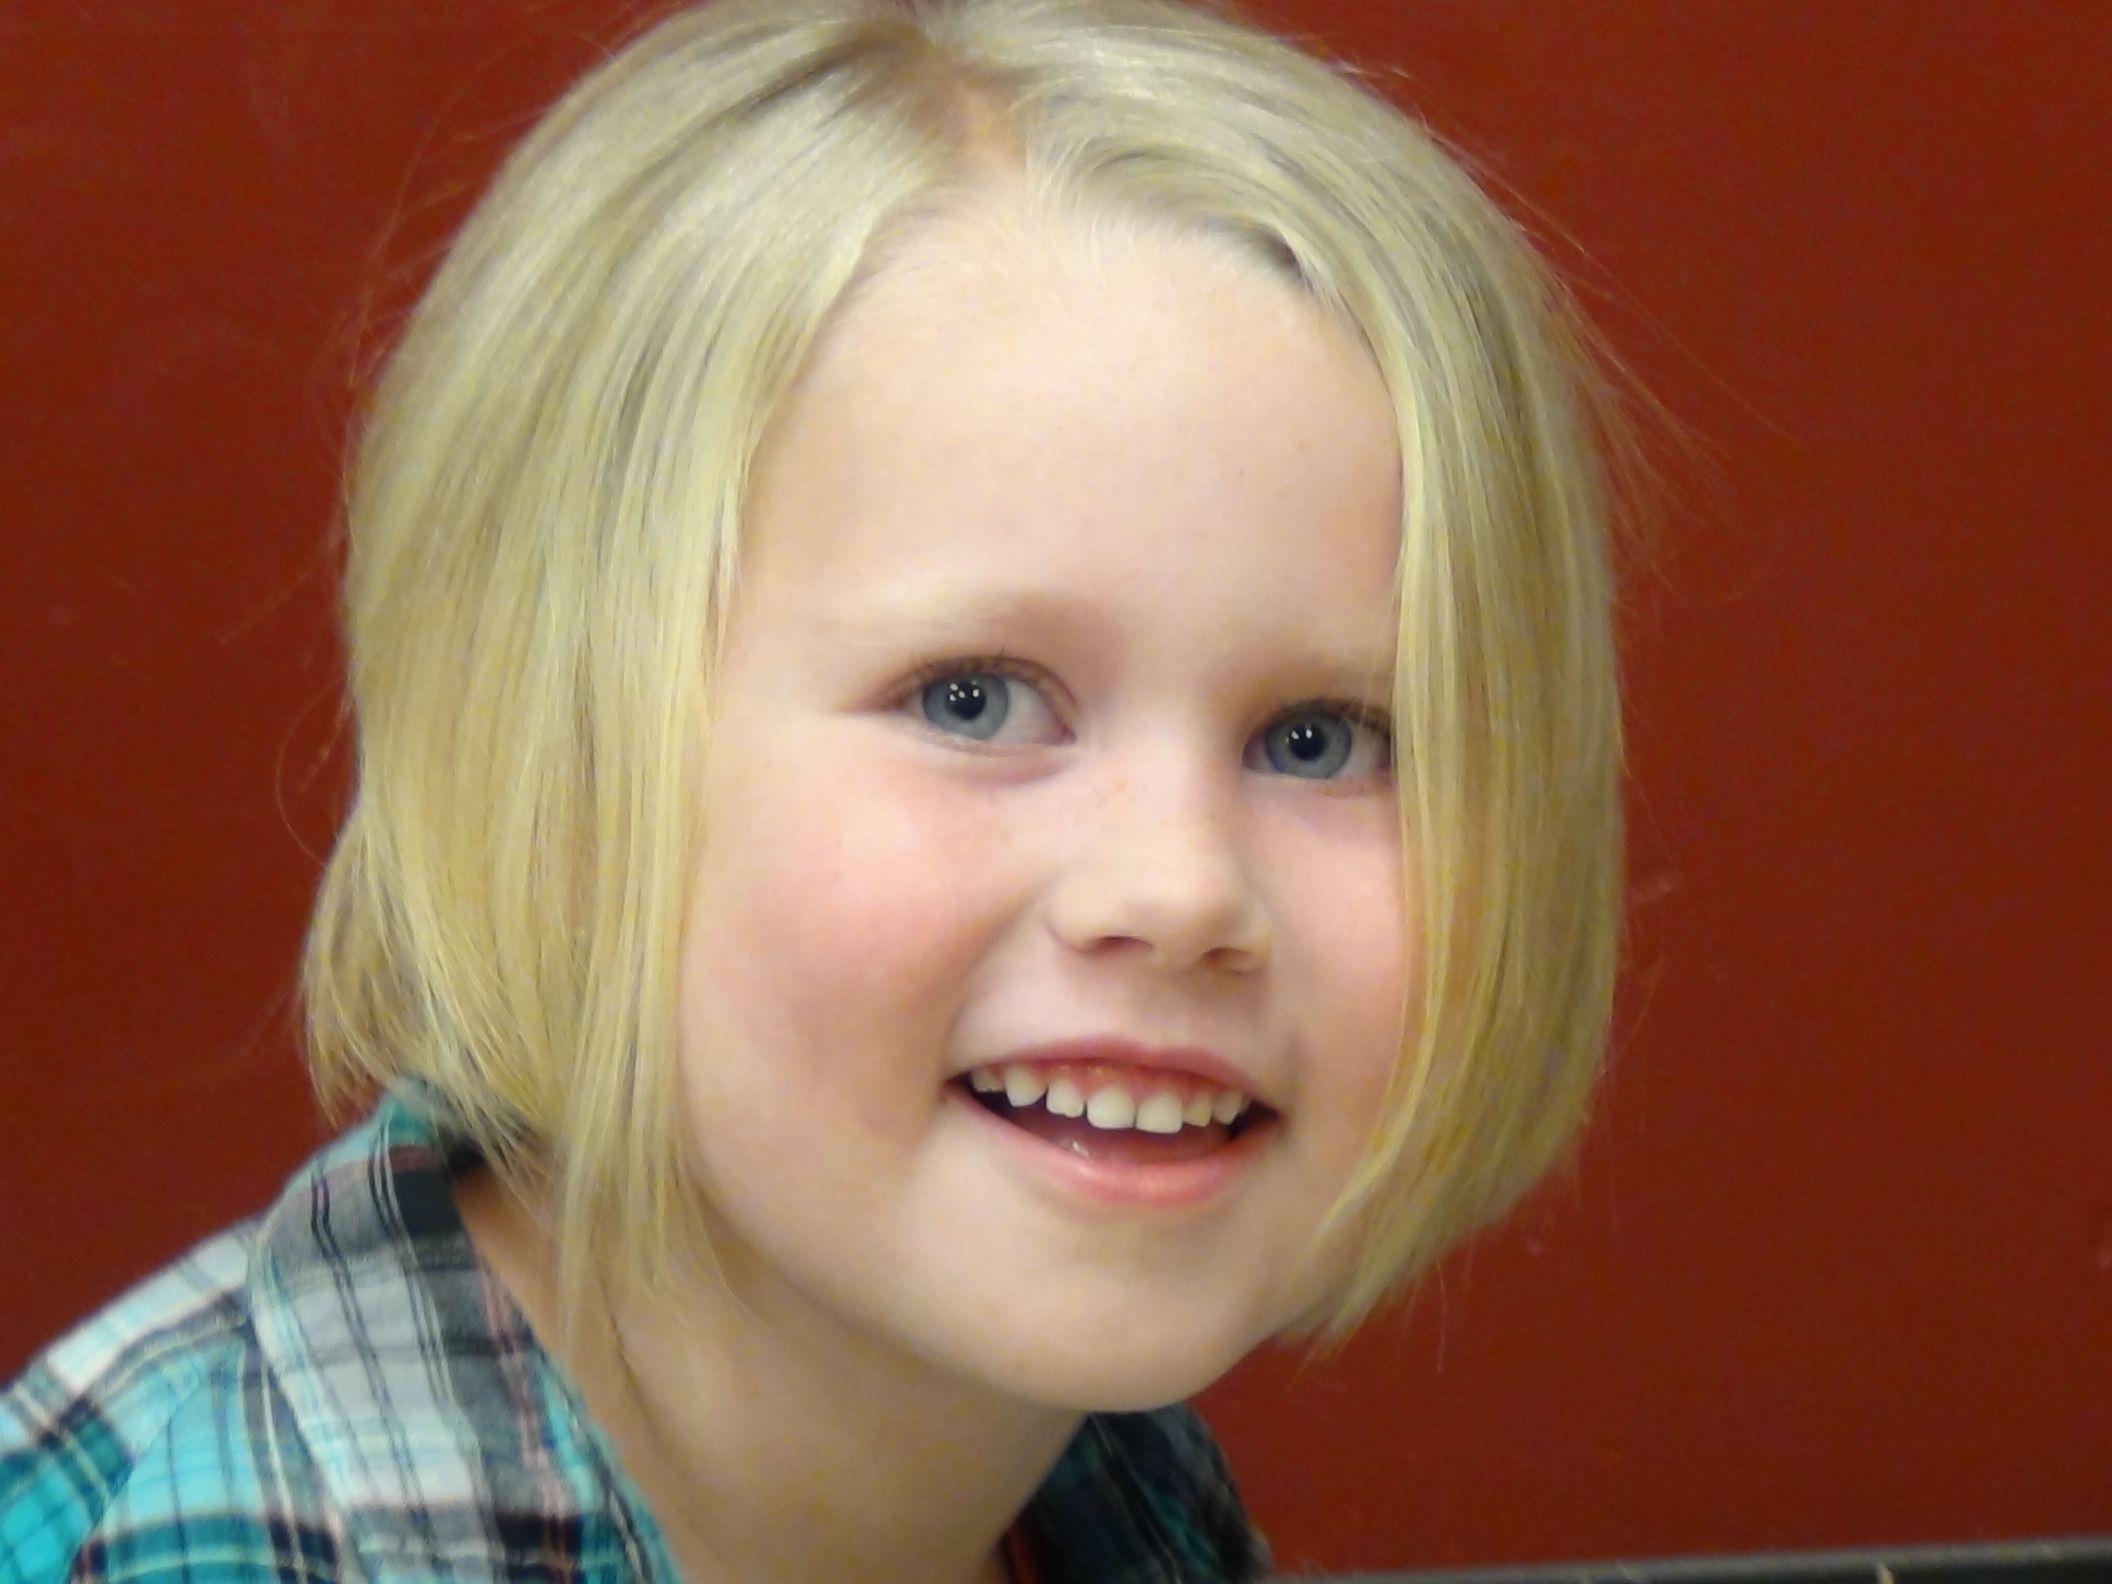 style a line haircut on the cutest little girl's hair   boys and